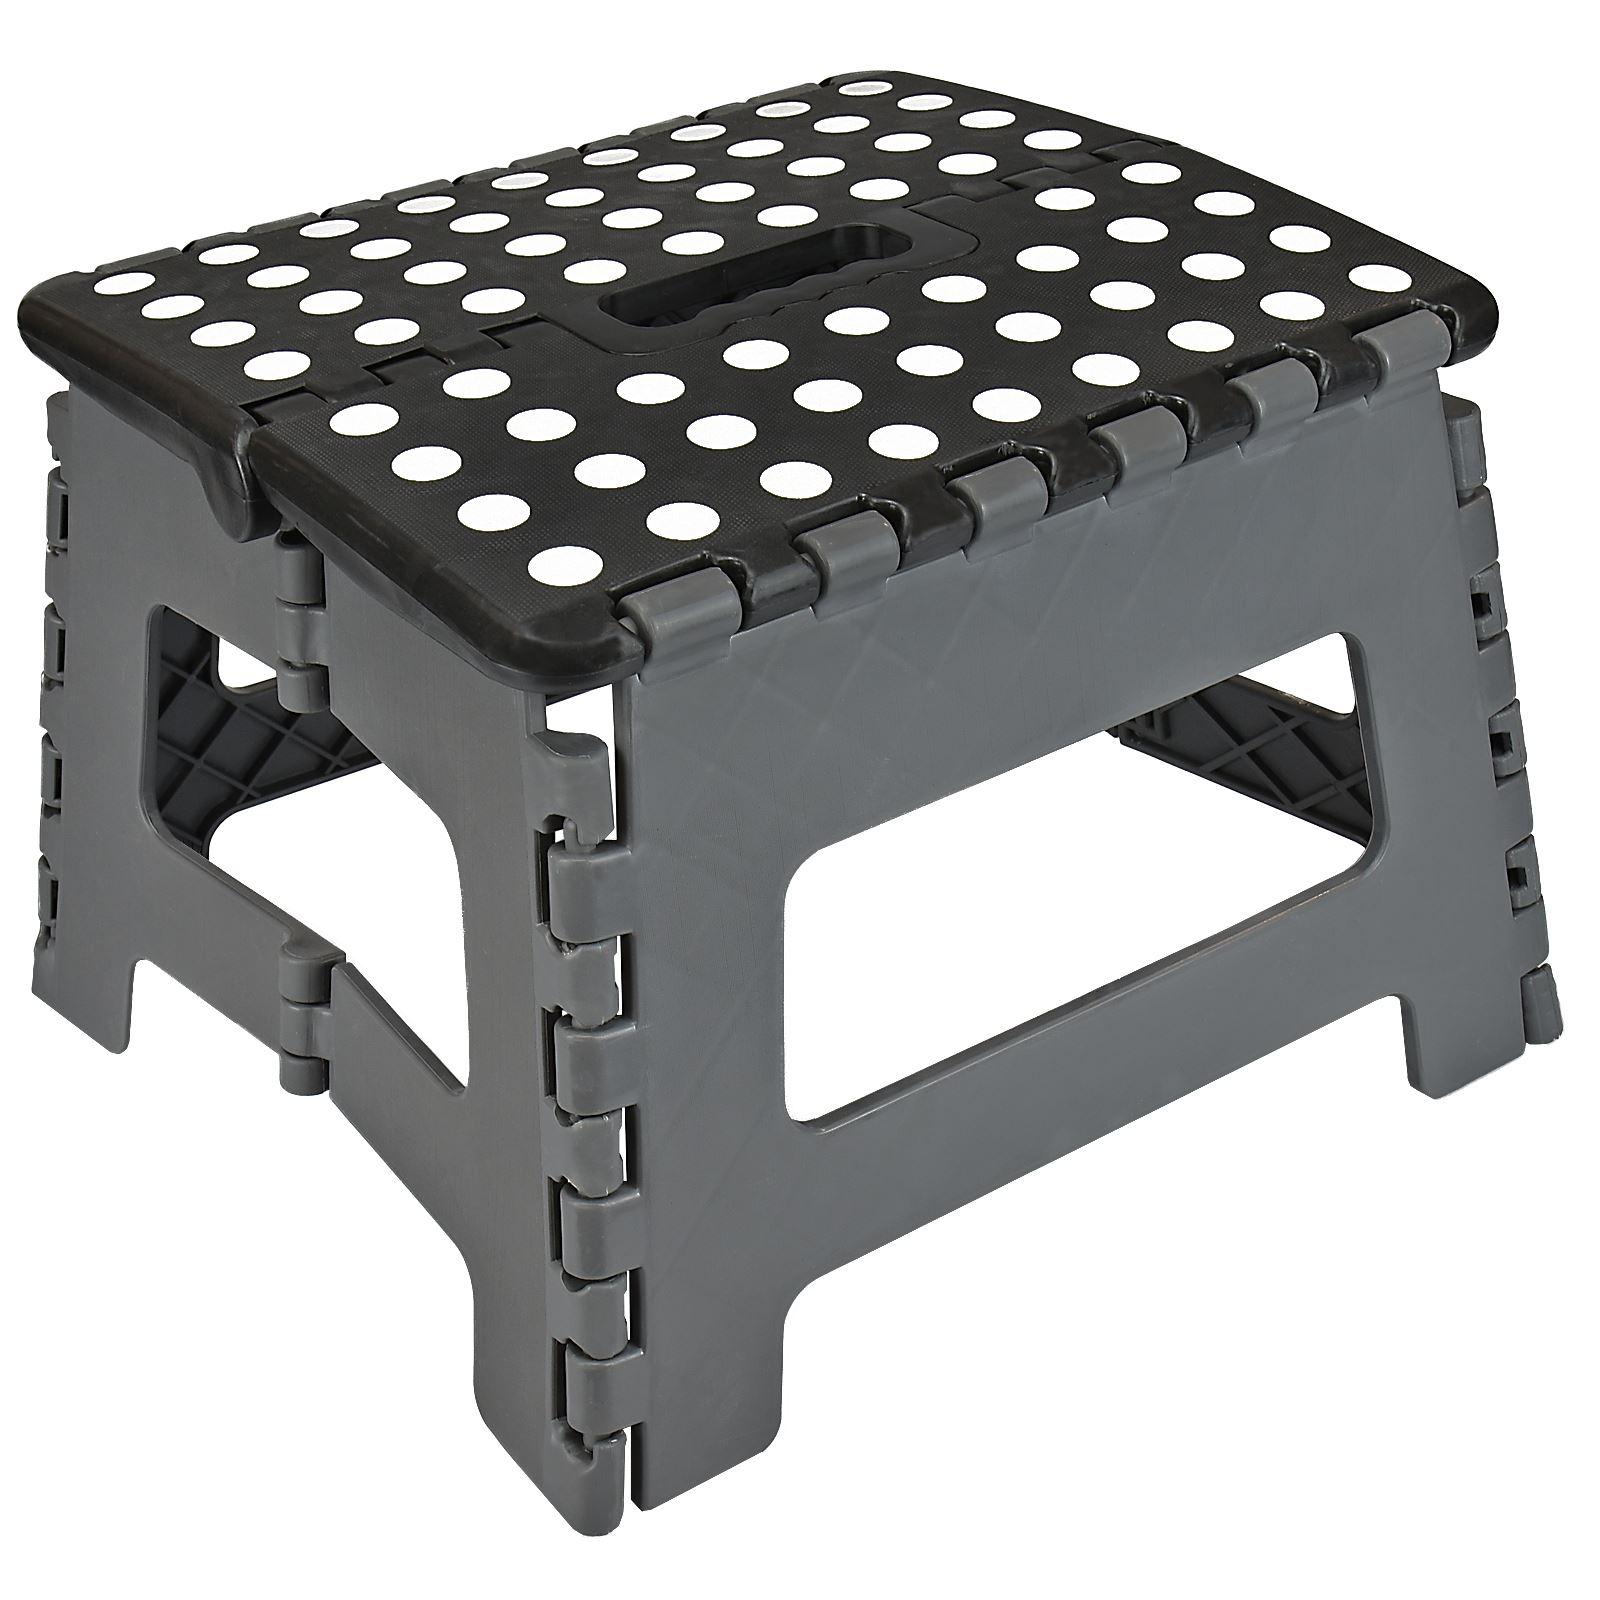 plastic multi purpose home kitchen folding step stool foldable easy storage ebay. Black Bedroom Furniture Sets. Home Design Ideas